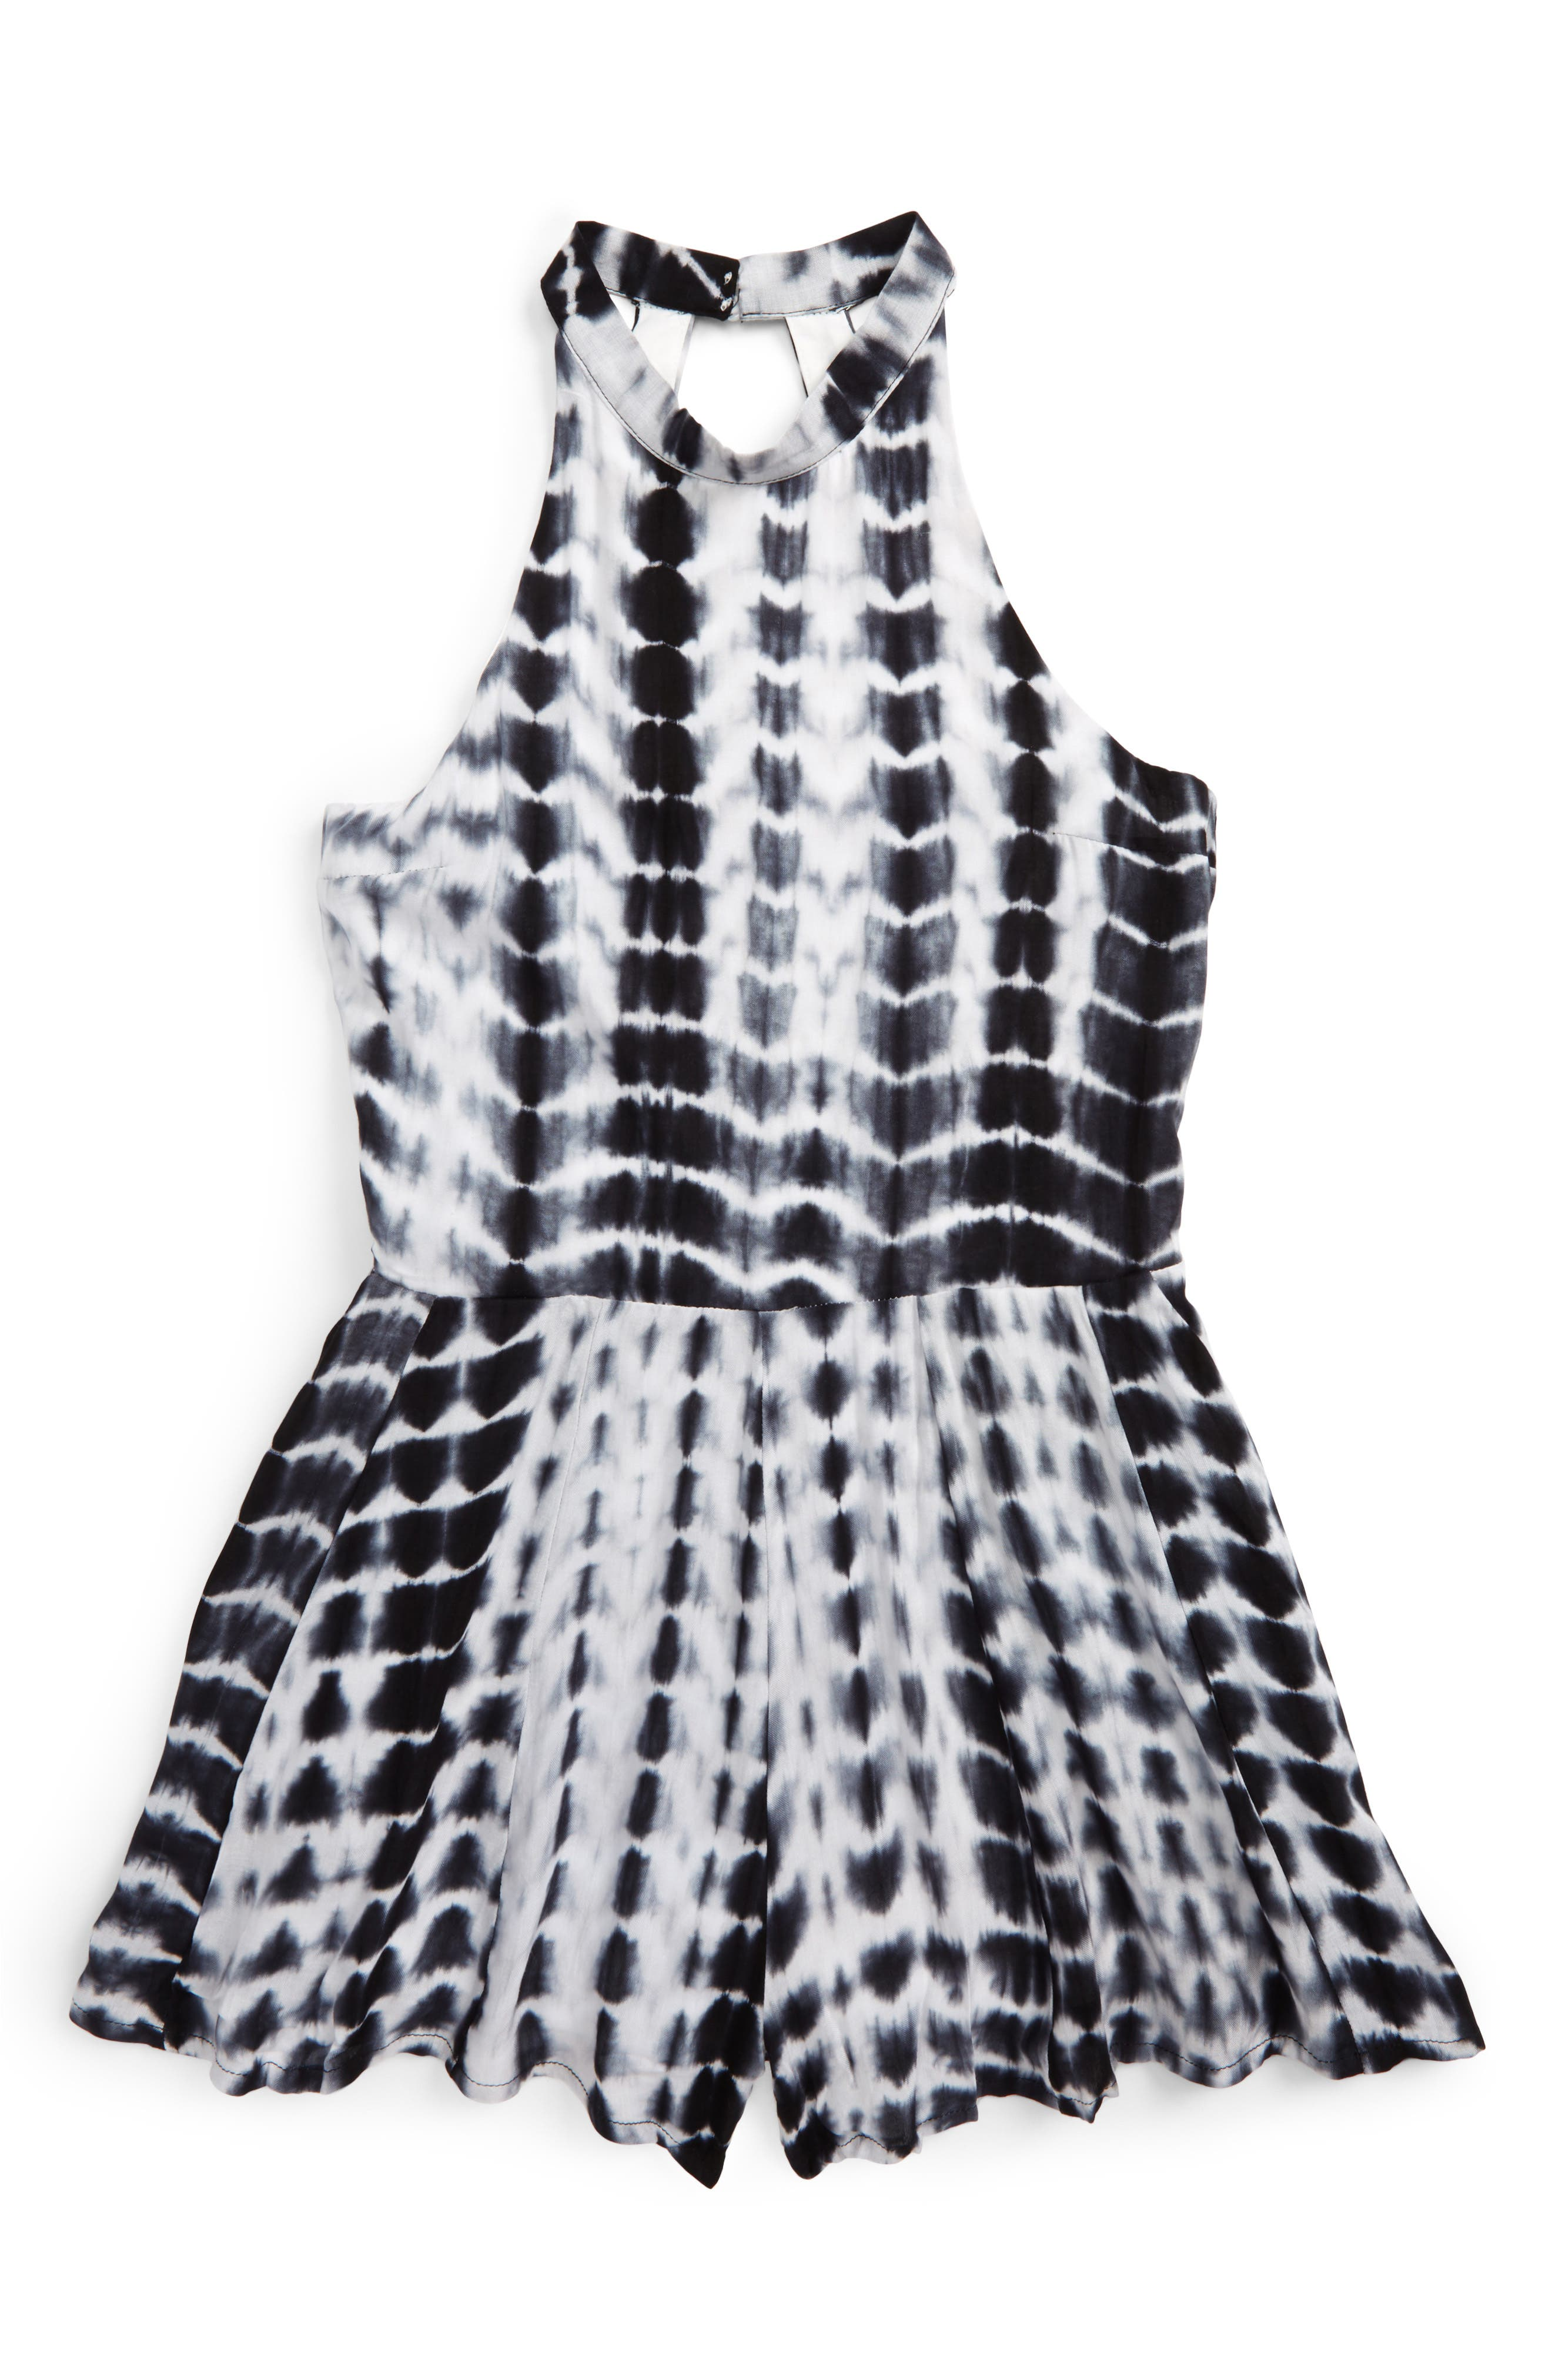 Main Image - Miss Behave Safira Tie Dye Print Romper (Big Girls)